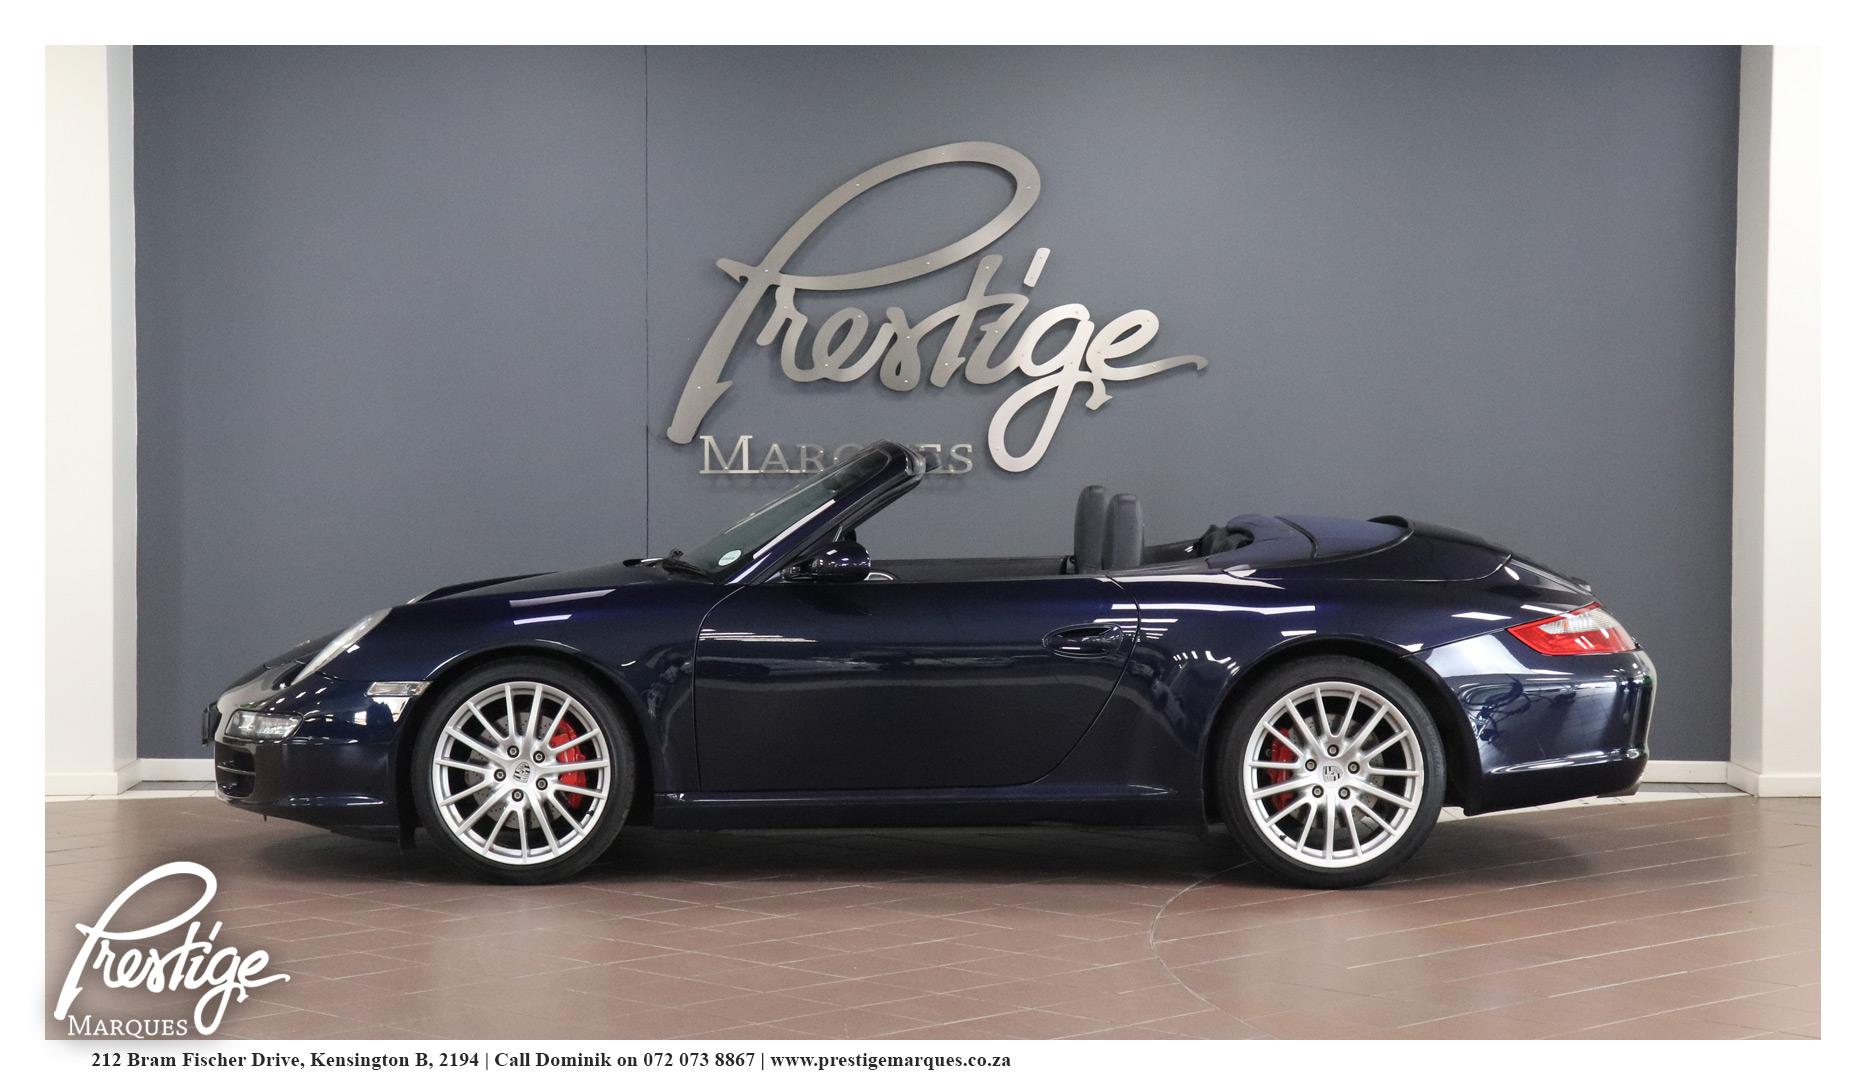 2005-Porsche-911-997-Carrera-S-Cabriolet-Tiptronic-Prestige-Marques-Randburg-Sandton-11